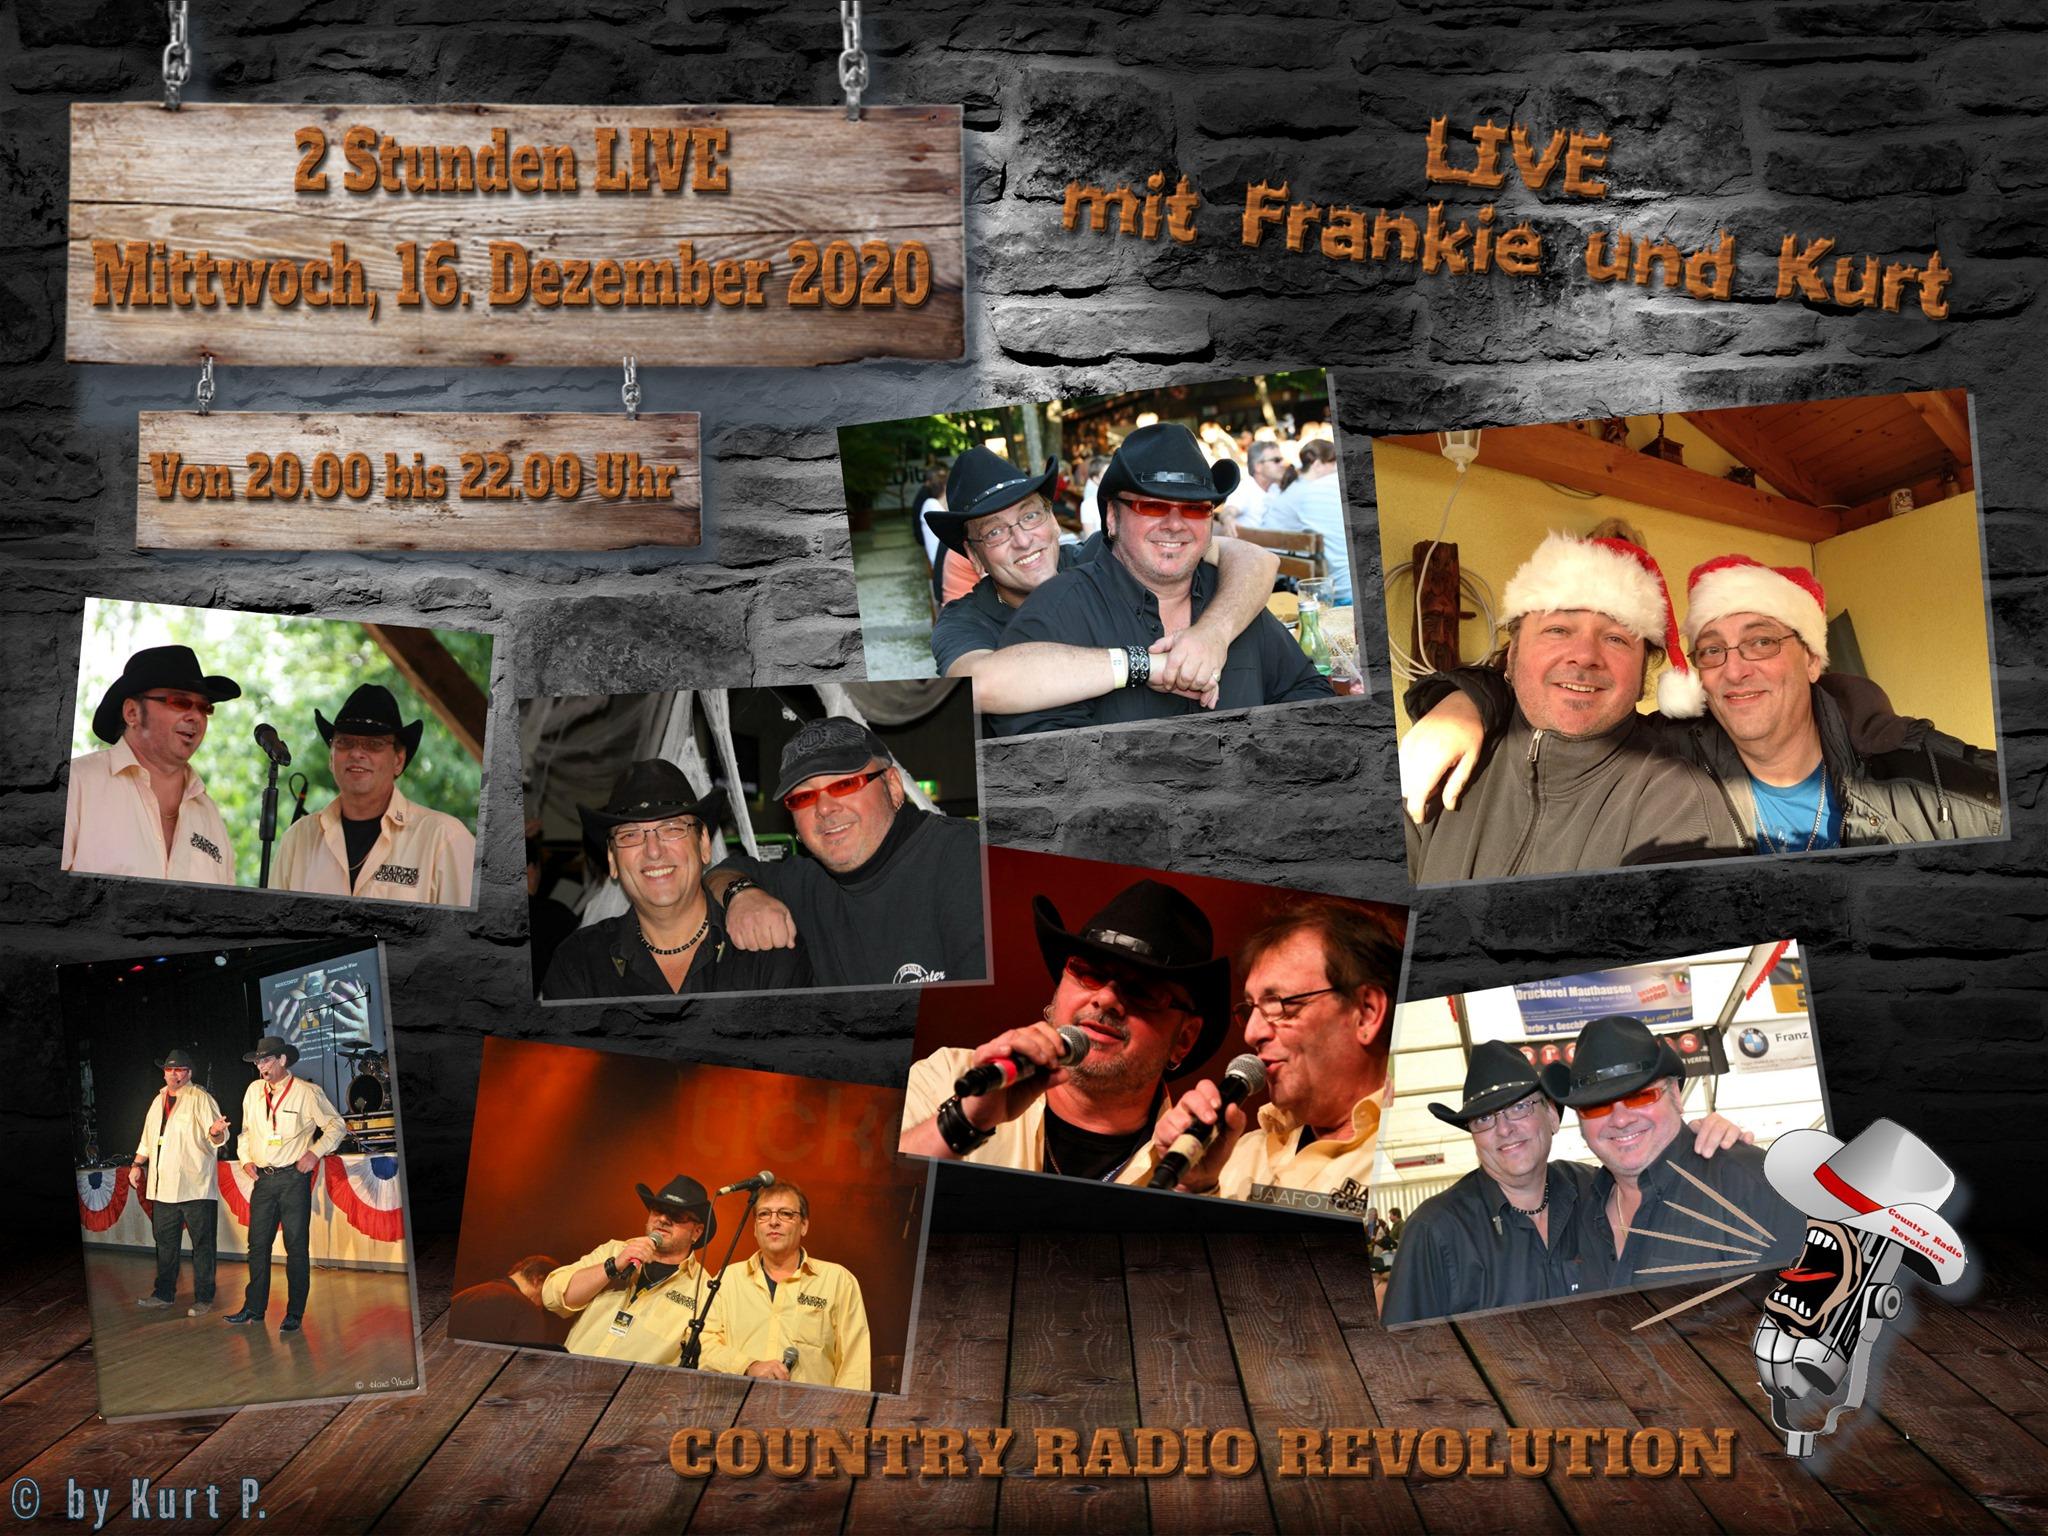 16. Dezember 2020 Frankie Fortyn bei Country Radio Revolution